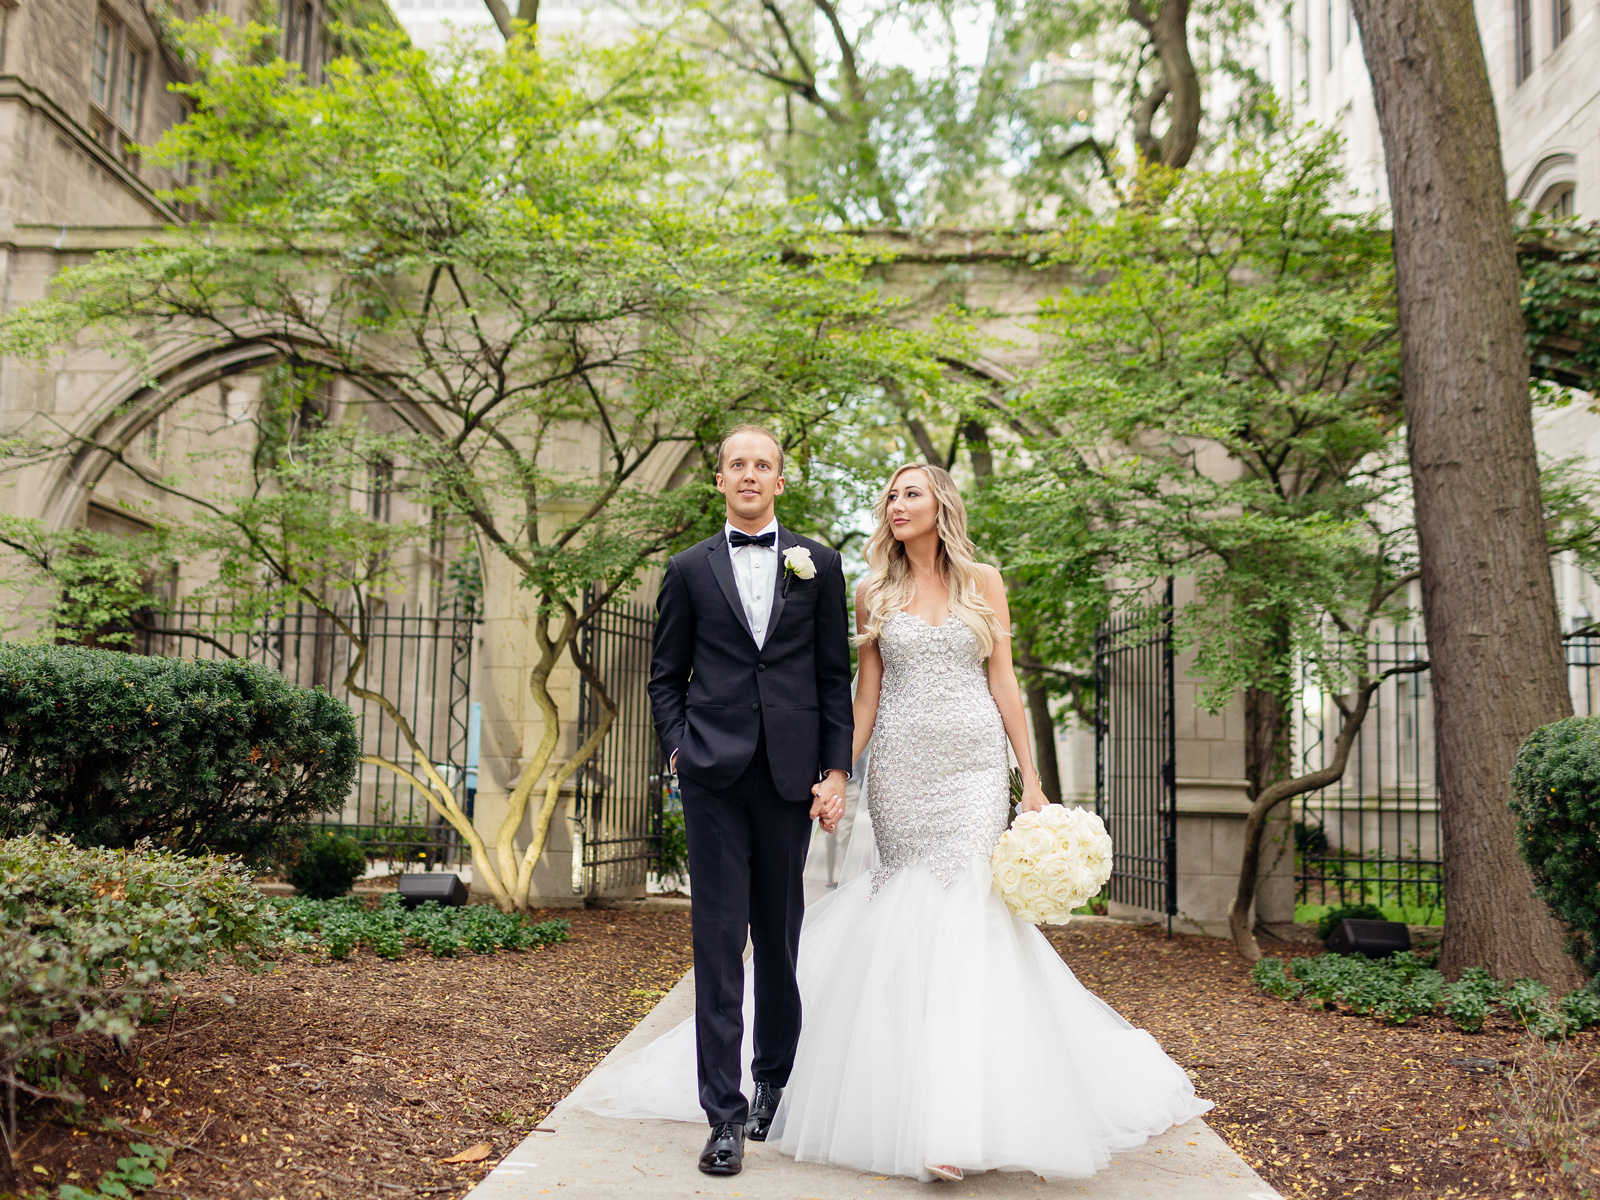 57331b7c5cdb Carly Cristman Wedding Album. Chicago, Illinois. (Credit: Sarah Postma). THE  RING